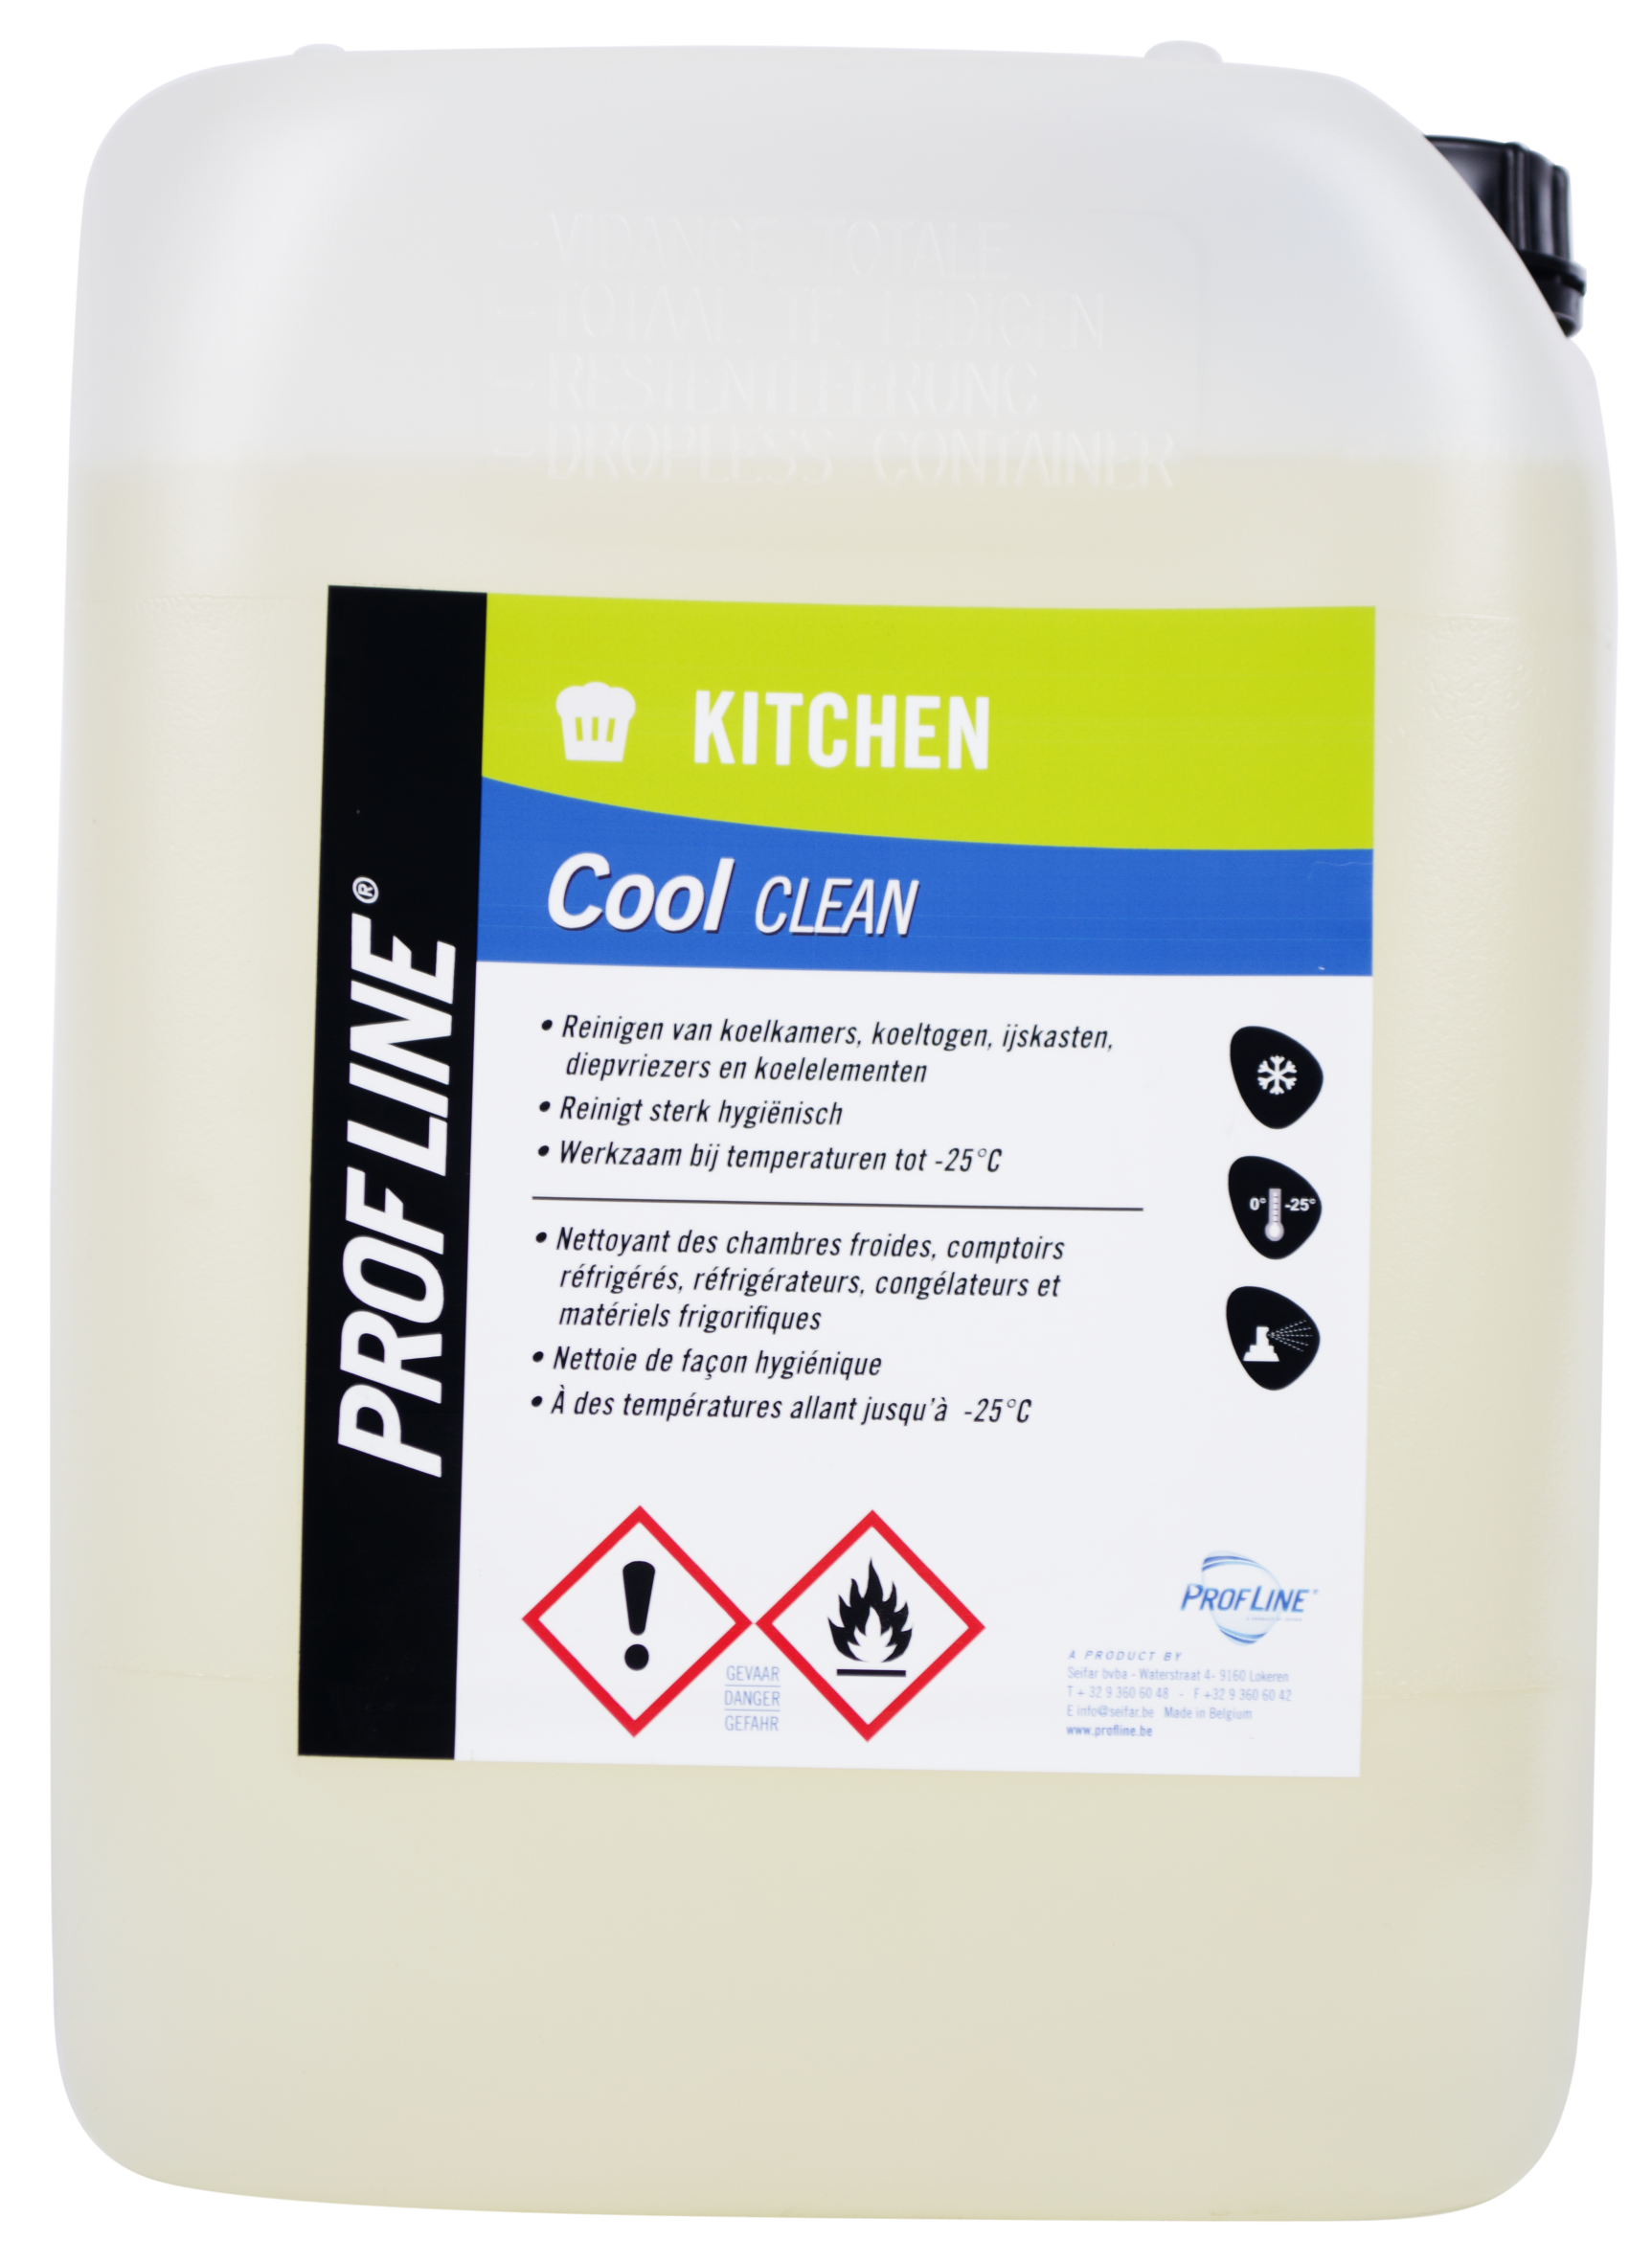 SEIFAR profline coolclean